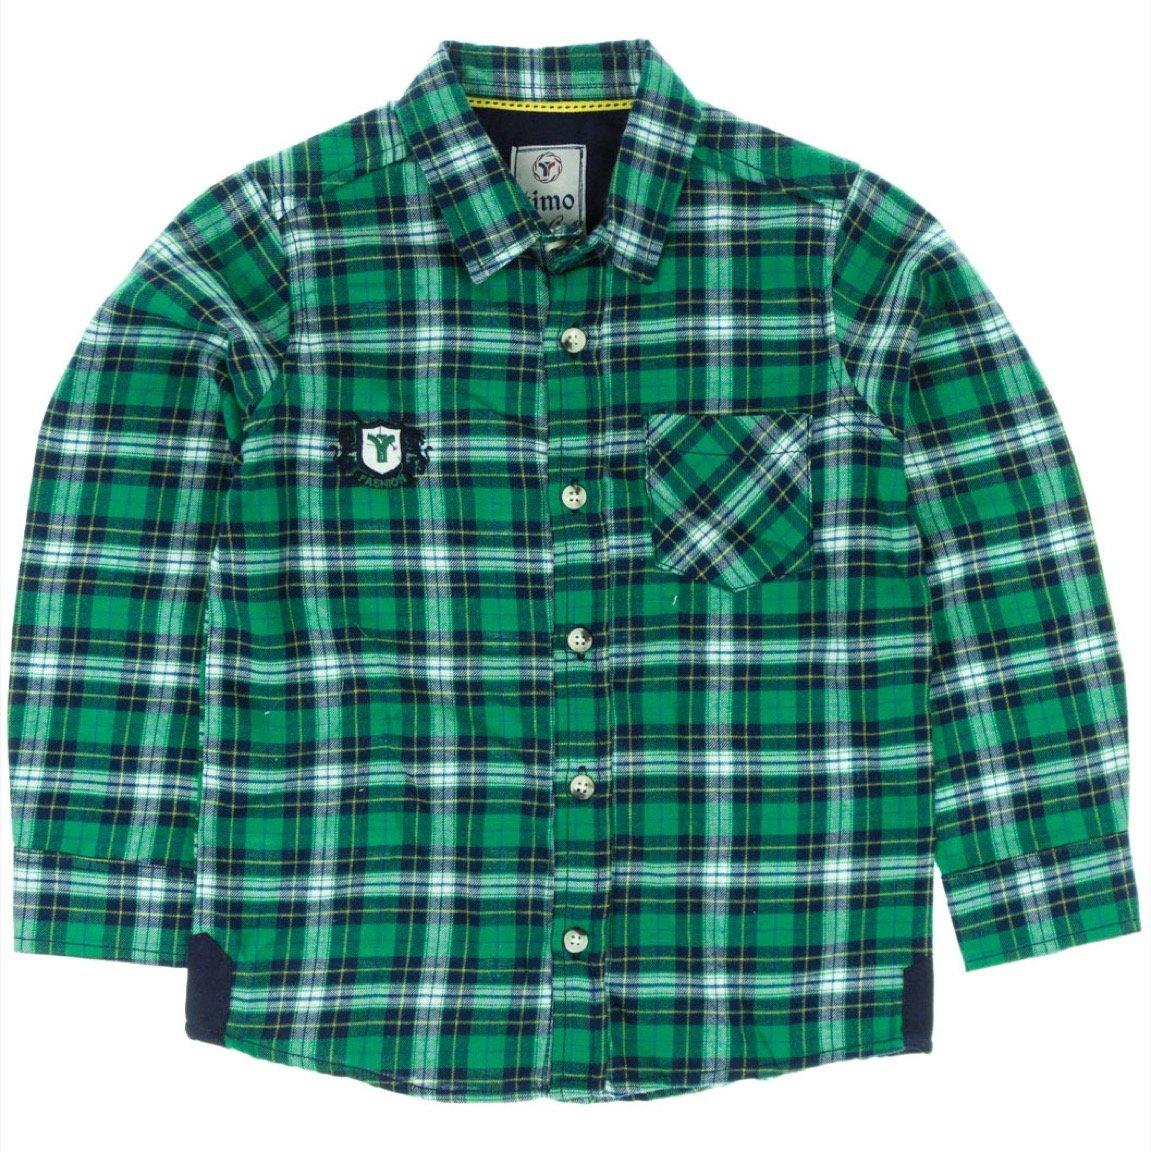 Timo παιδικό πουκάμισο «Checkered»